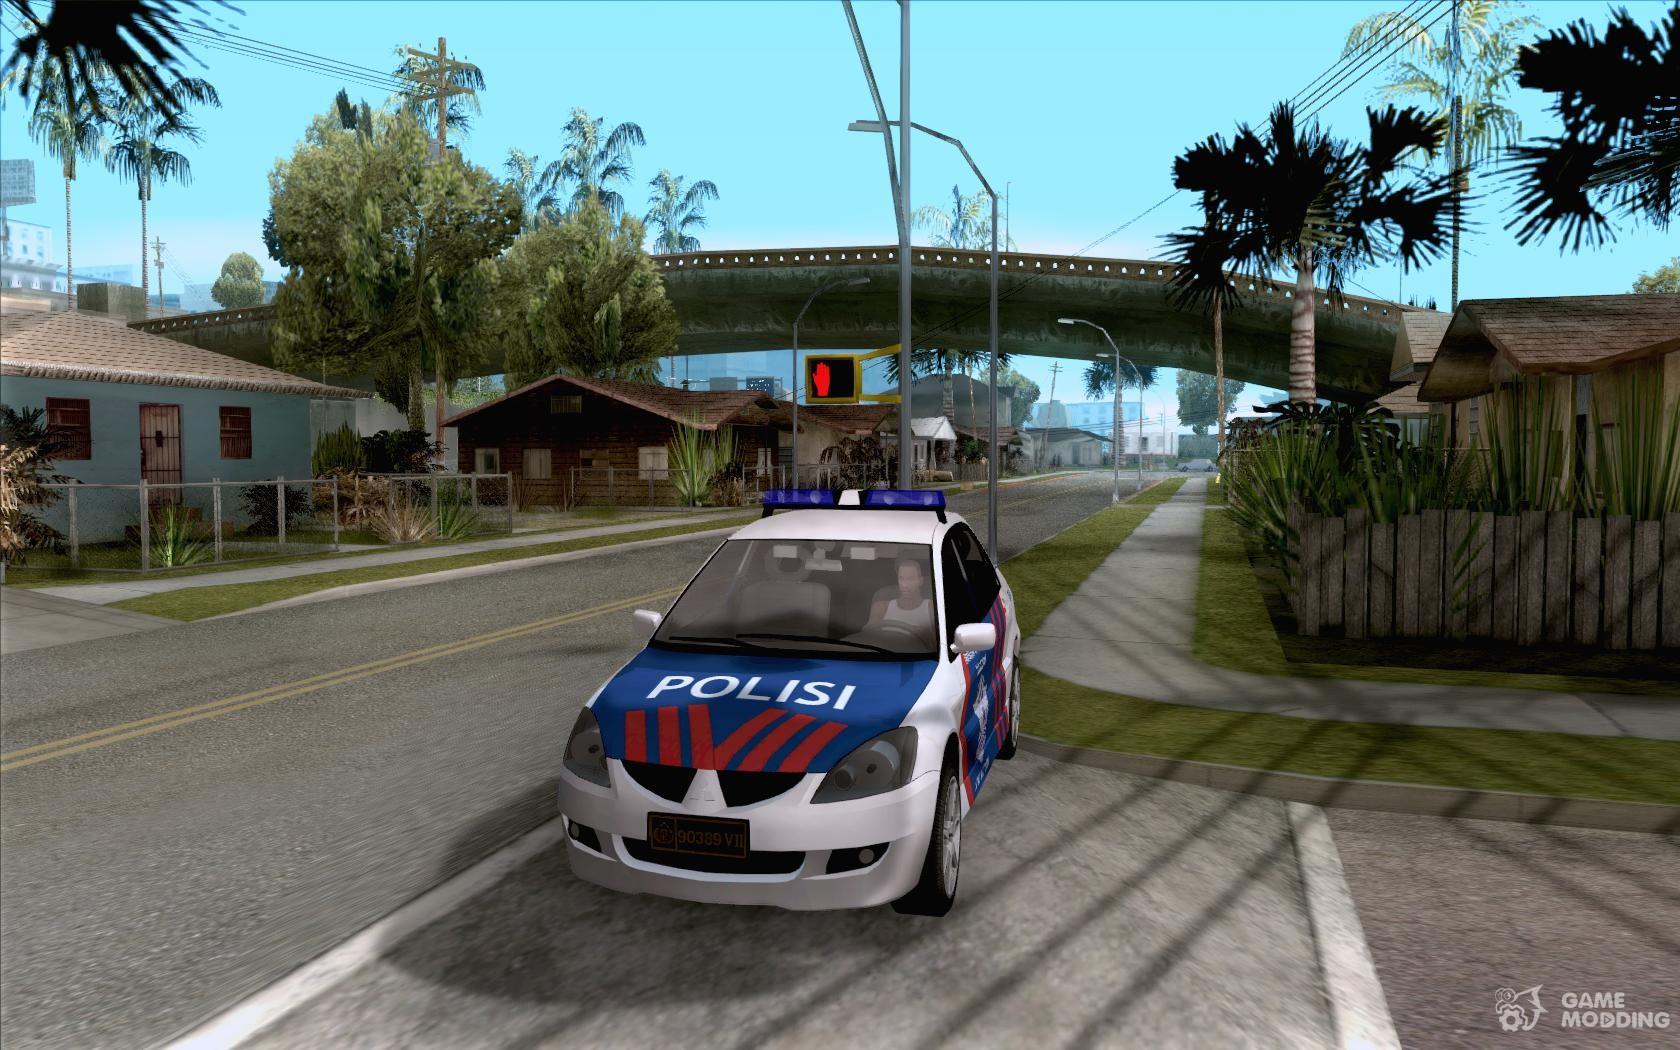 Mitsubishi Lancer Police Indonesia For Gta San Andreas